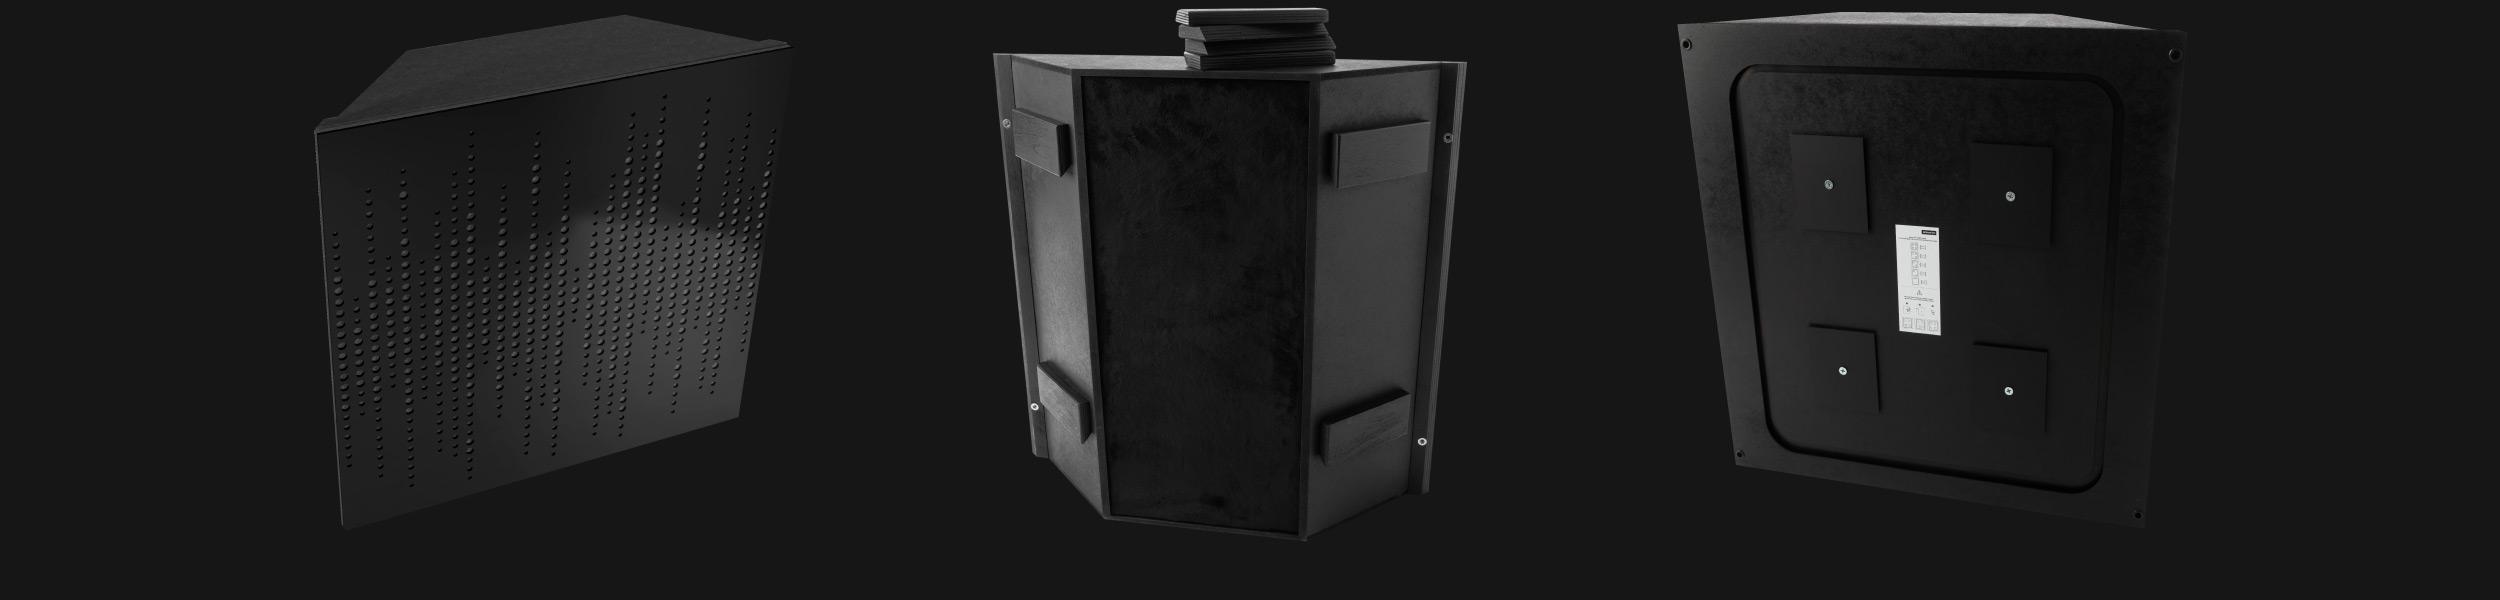 Artnovion product basstrap corner perforated a31238655b